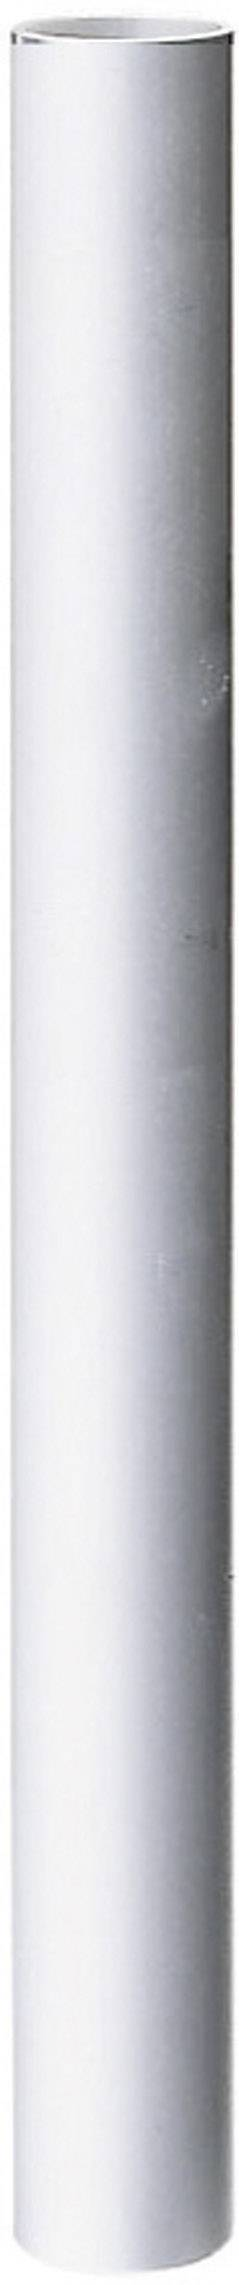 Hliníková trubka Werma Signaltechnik 975.845.10, 100 mm, Ø 25 mm